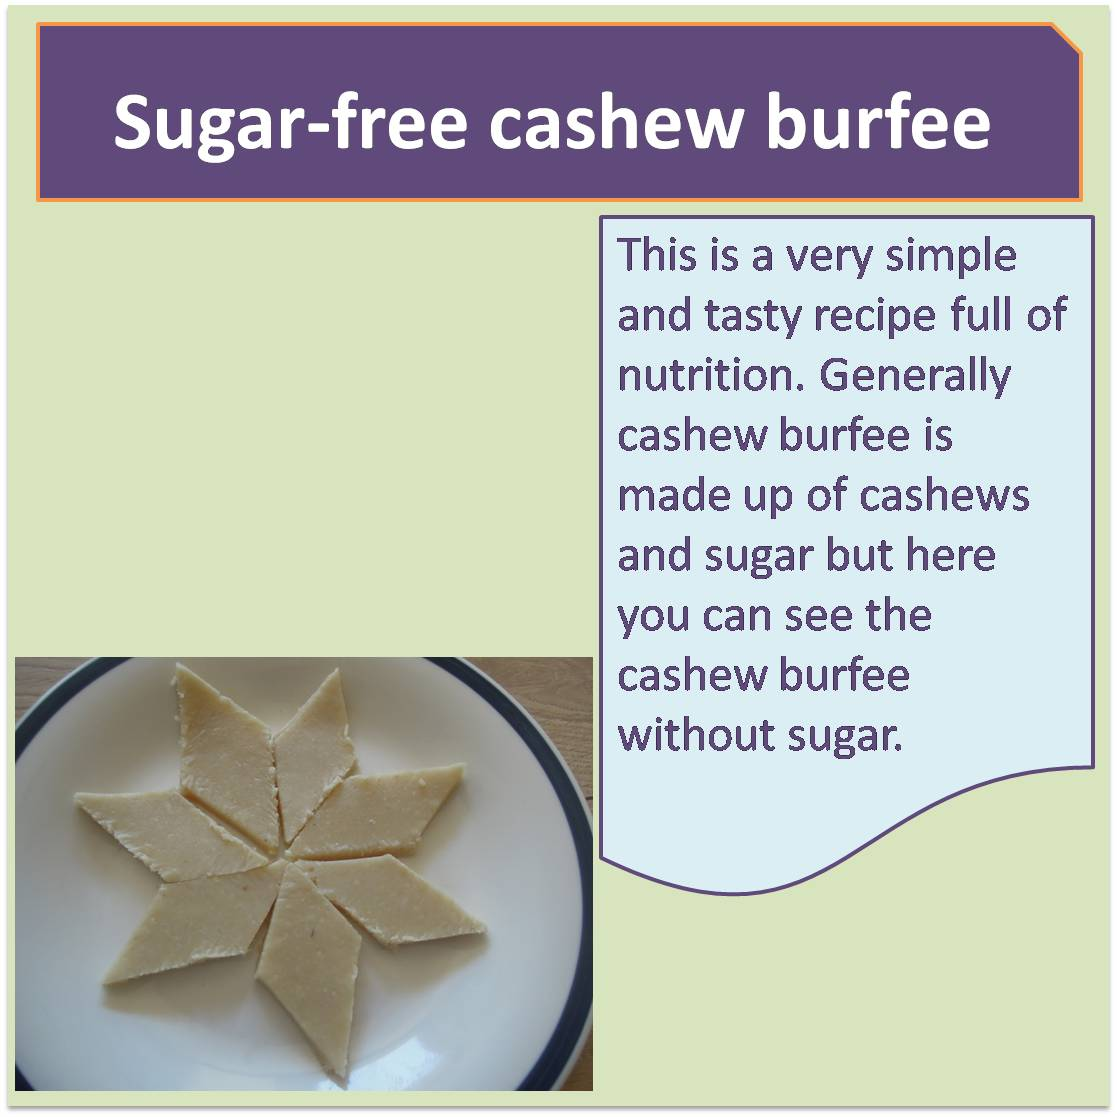 Sugar-free cashew burfee